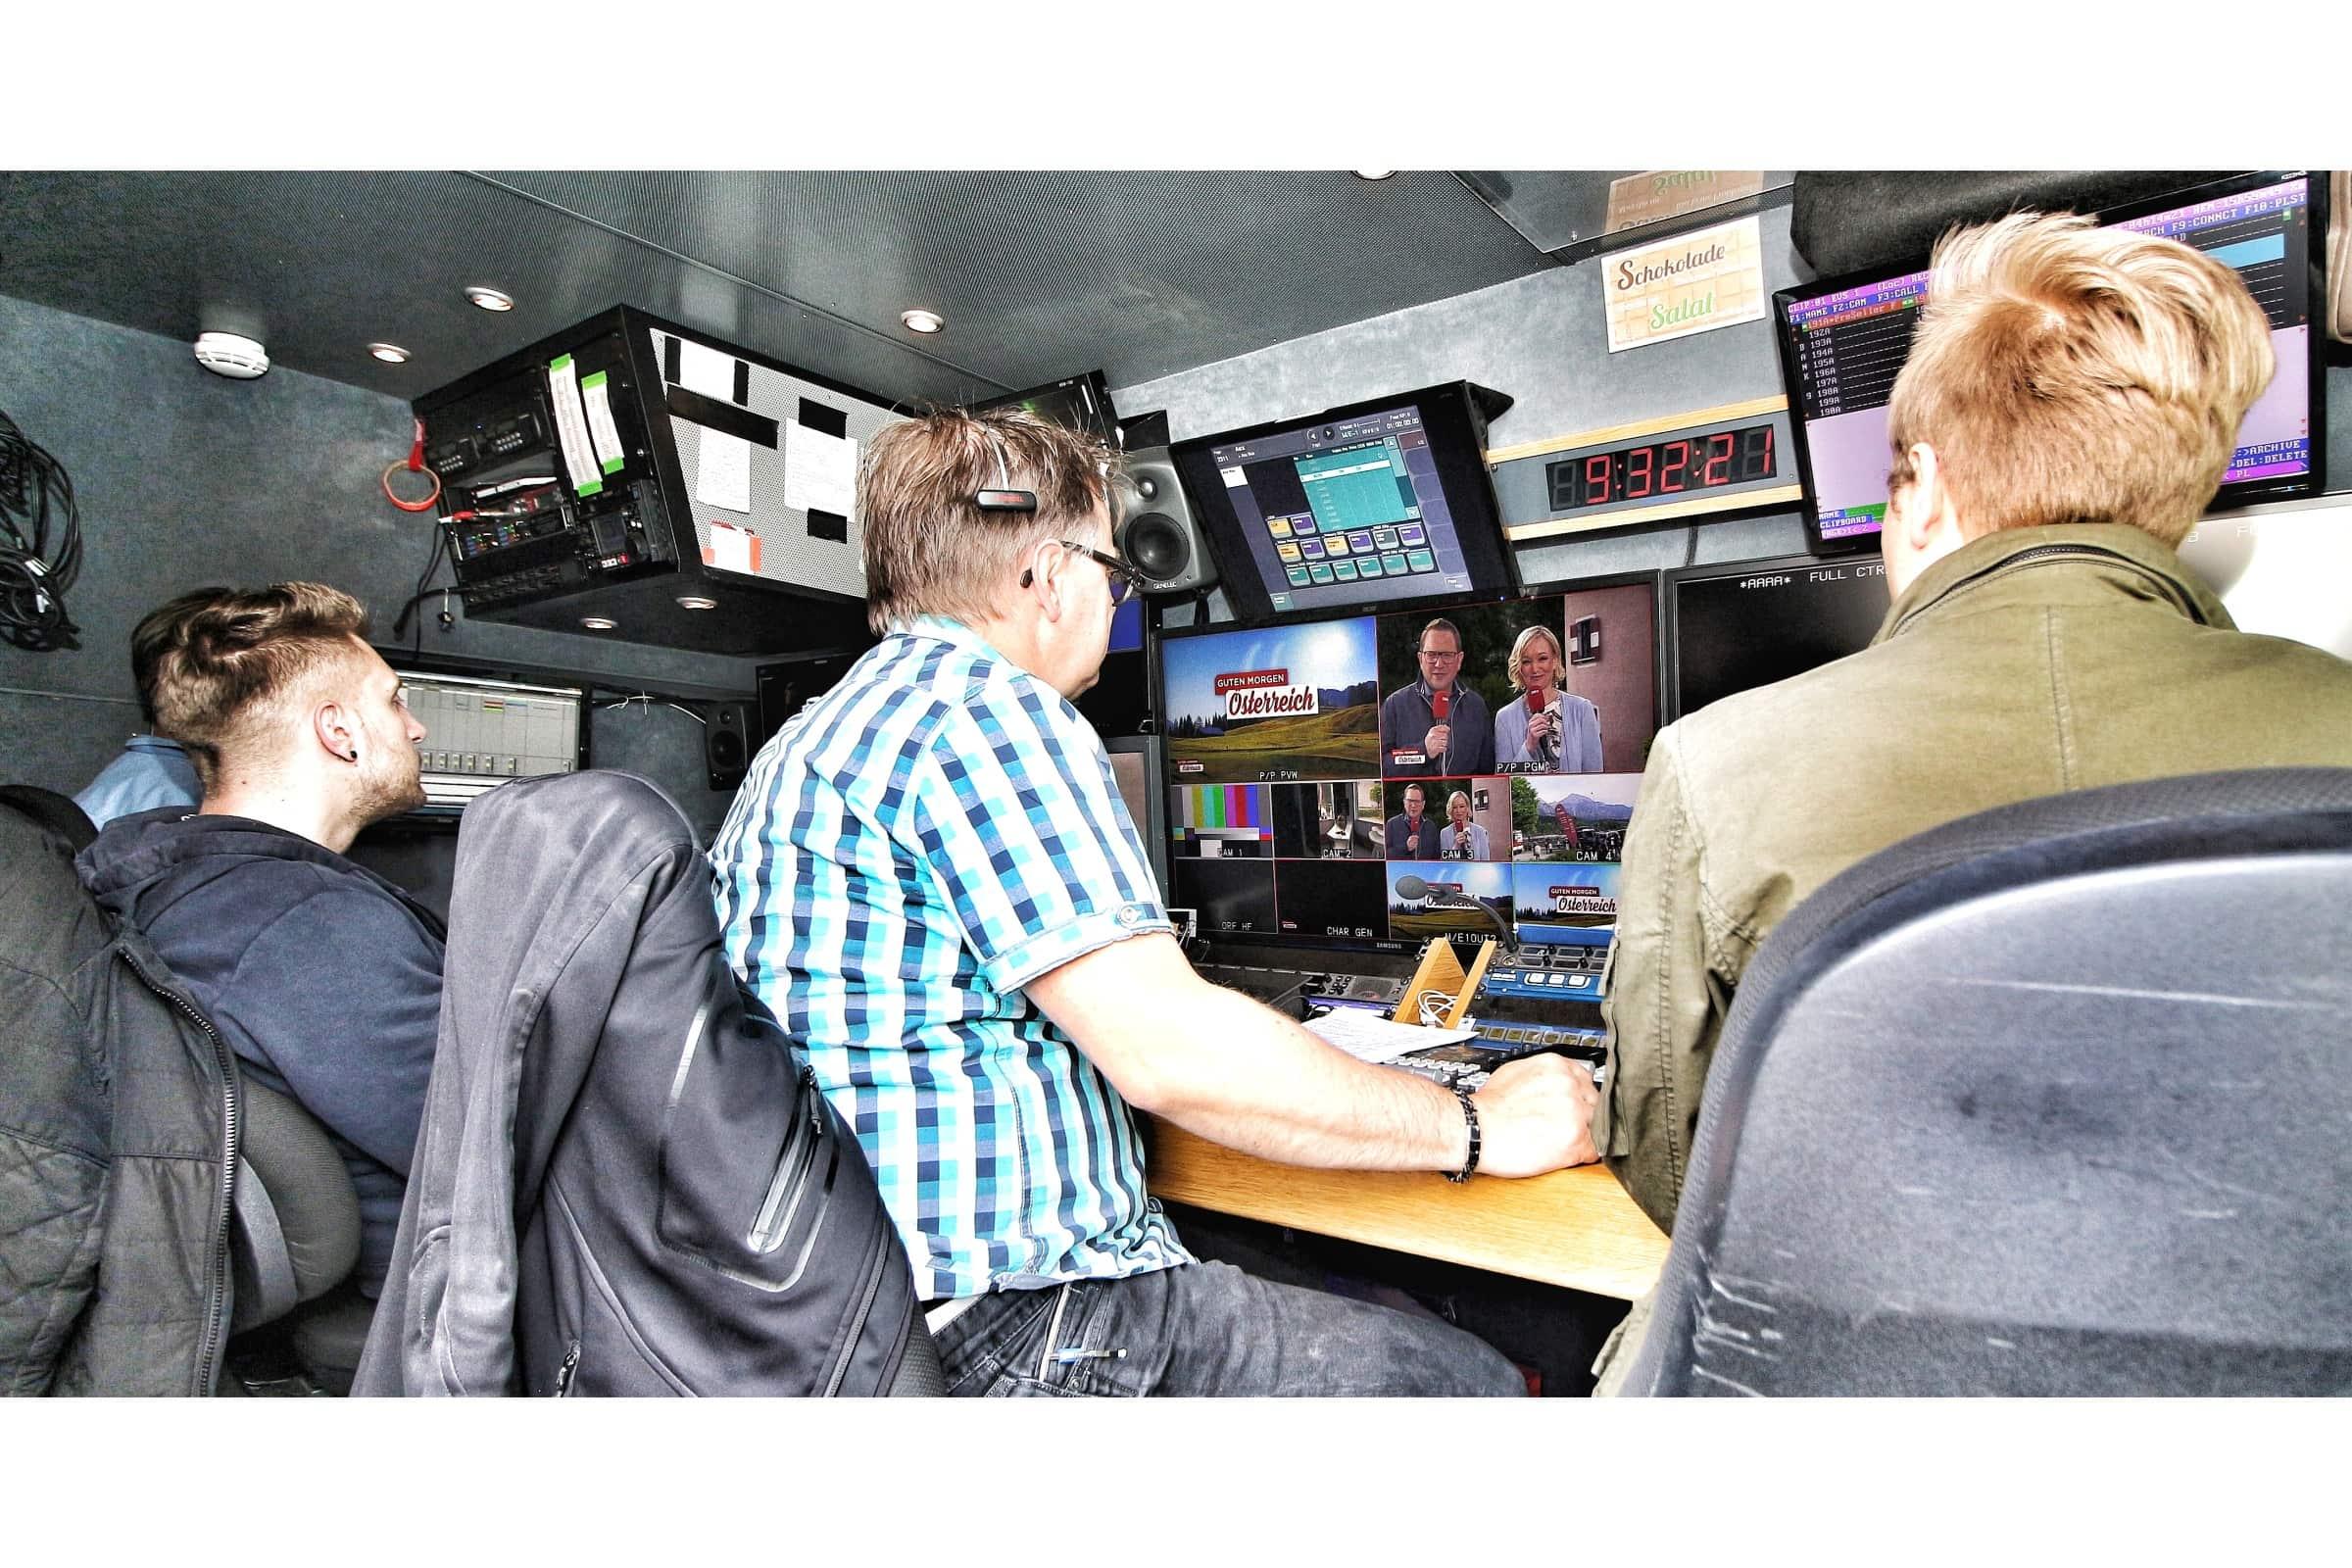 andreas felder kameramann orf unterwegs in österreich 27 02.05.2018 09 40 20 - ORF Unterwegs in Österreich - Tirol